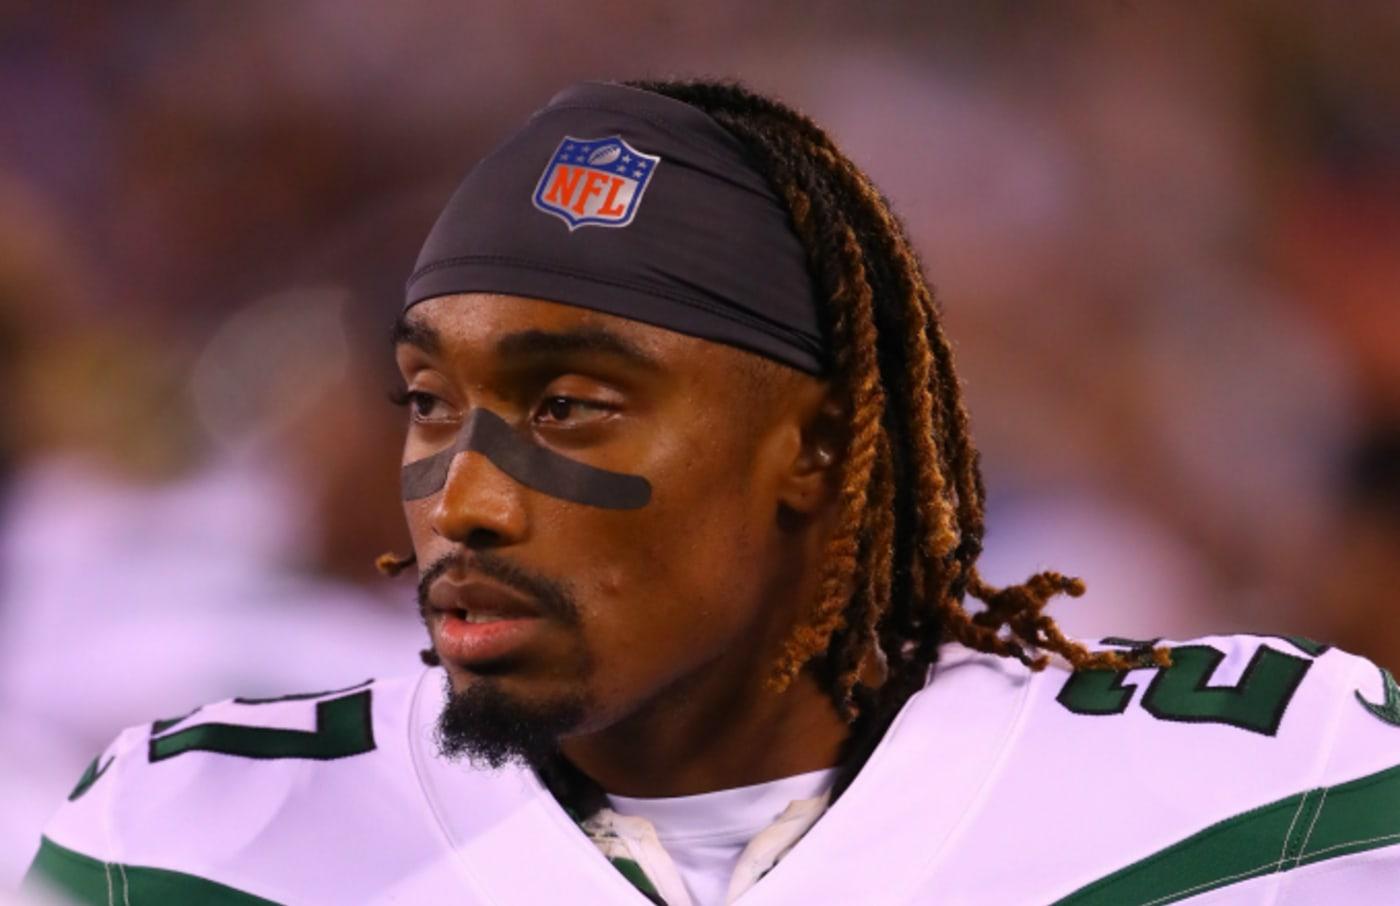 New York Jets cornerback Darryl Roberts